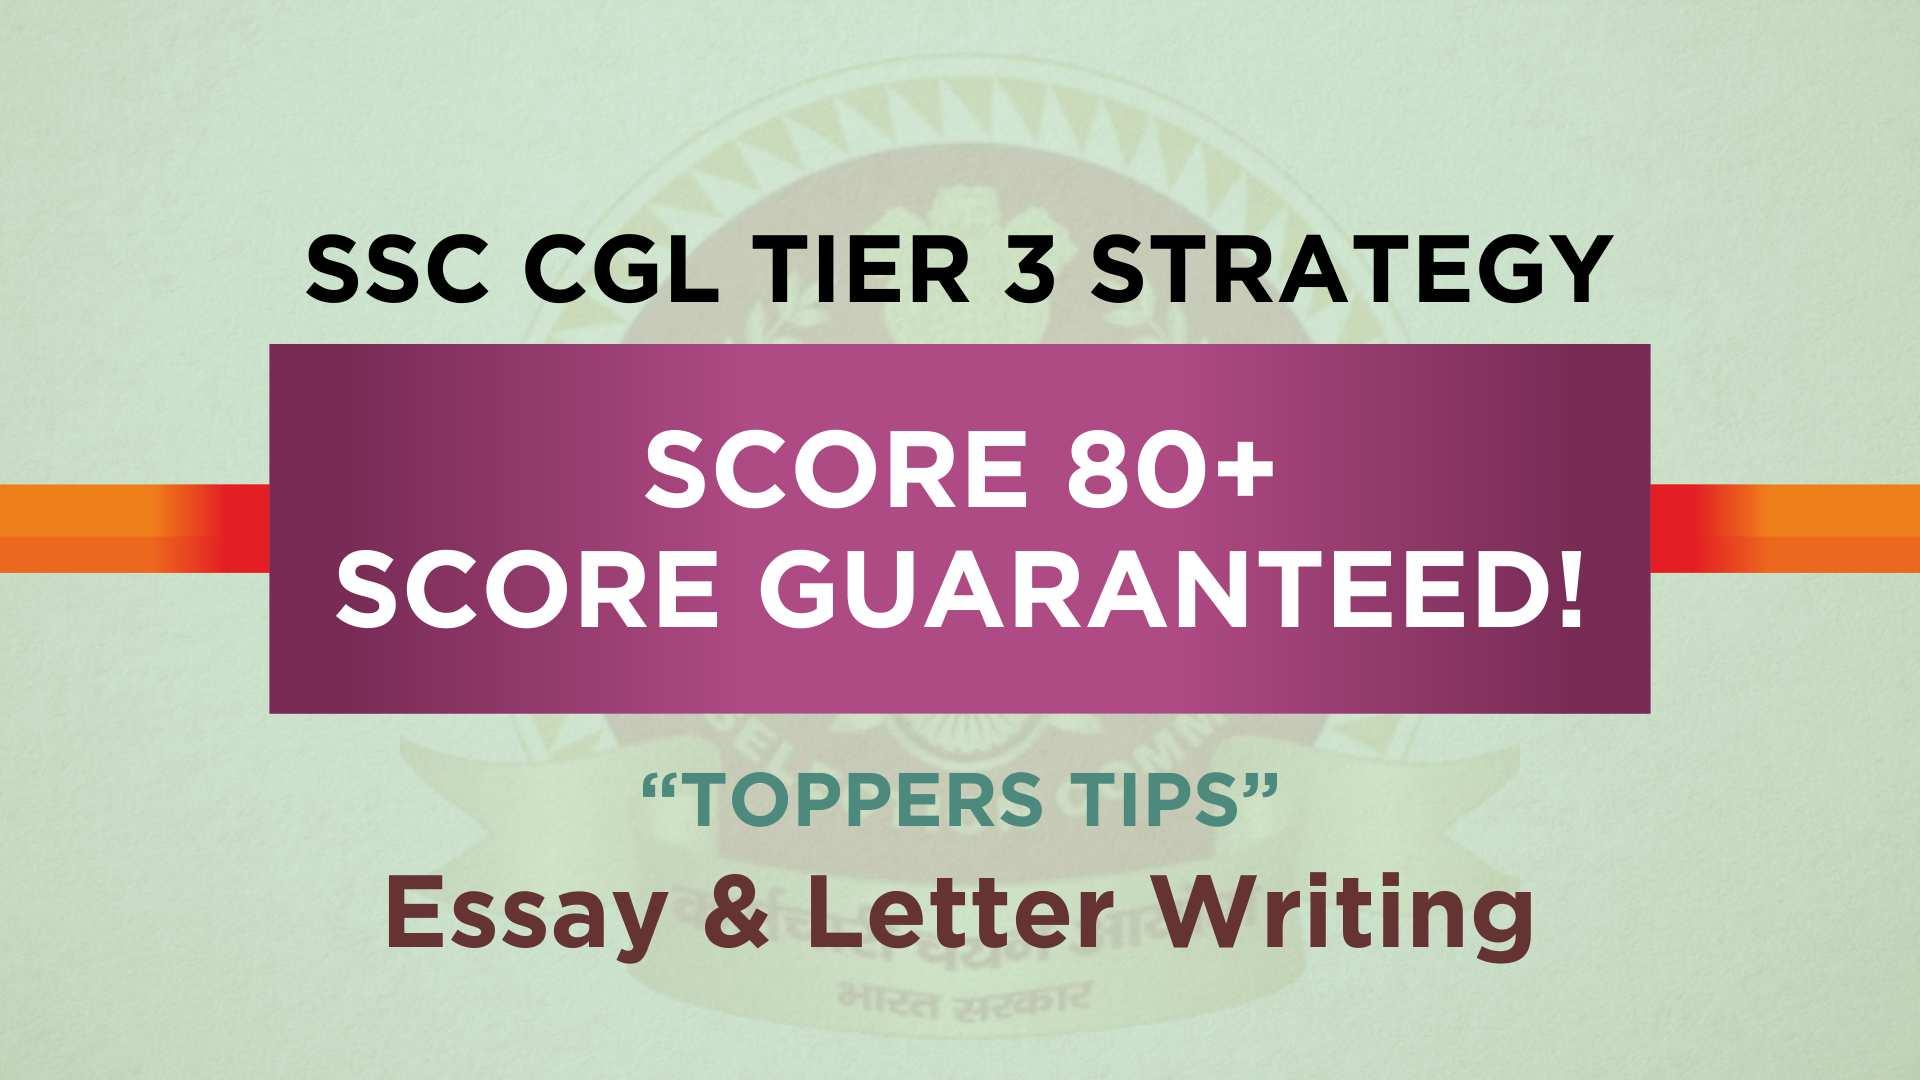 SSC CGL Tier 3 Exam pattern